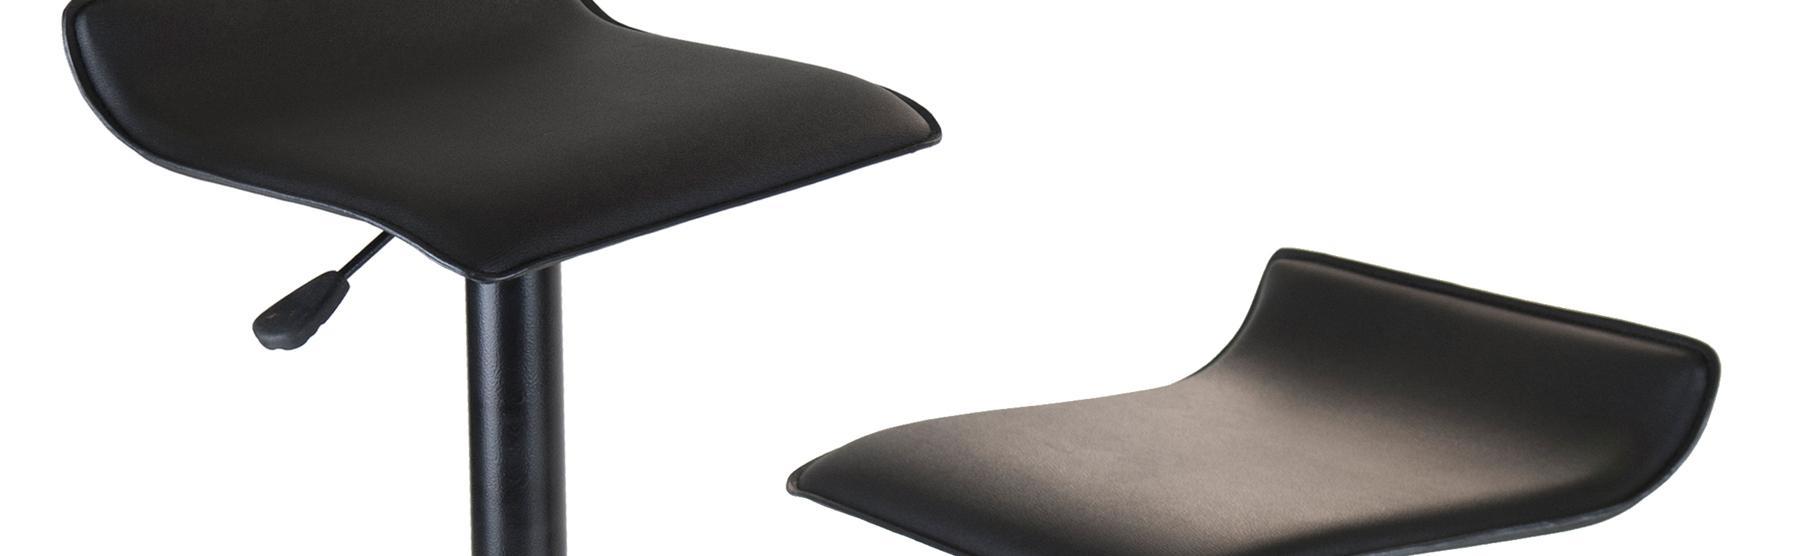 Amazon Com Winsome Wood Set Of 2 Obsidian Adjustable